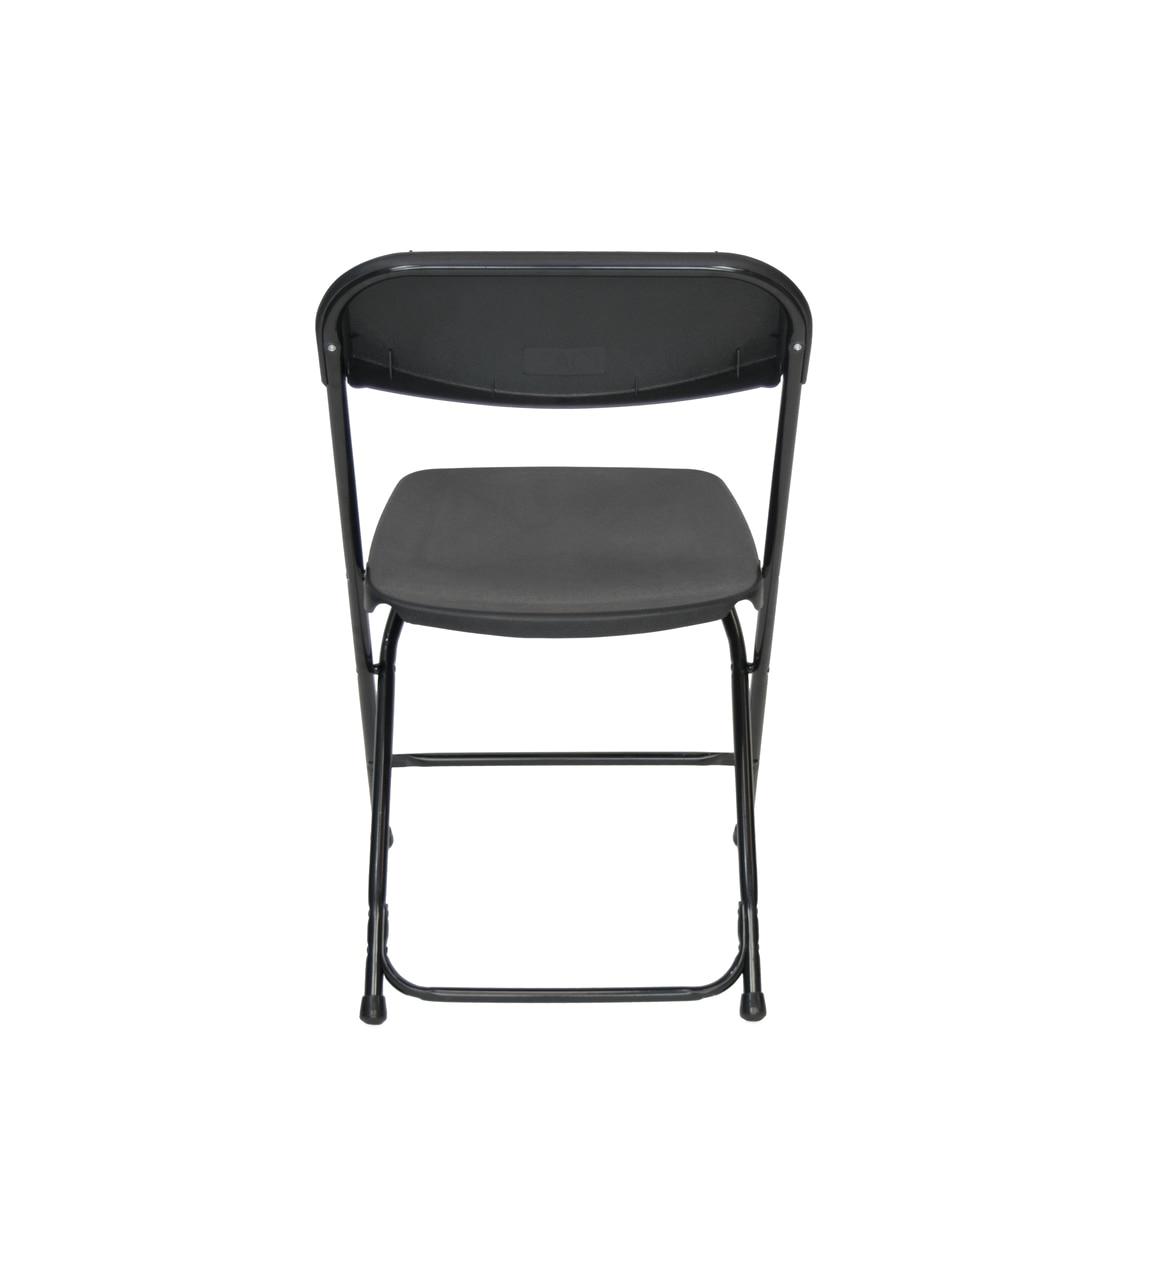 Sams Club Folding Chairs and Tables Black Plastic Folding Chair Premium Rental Style